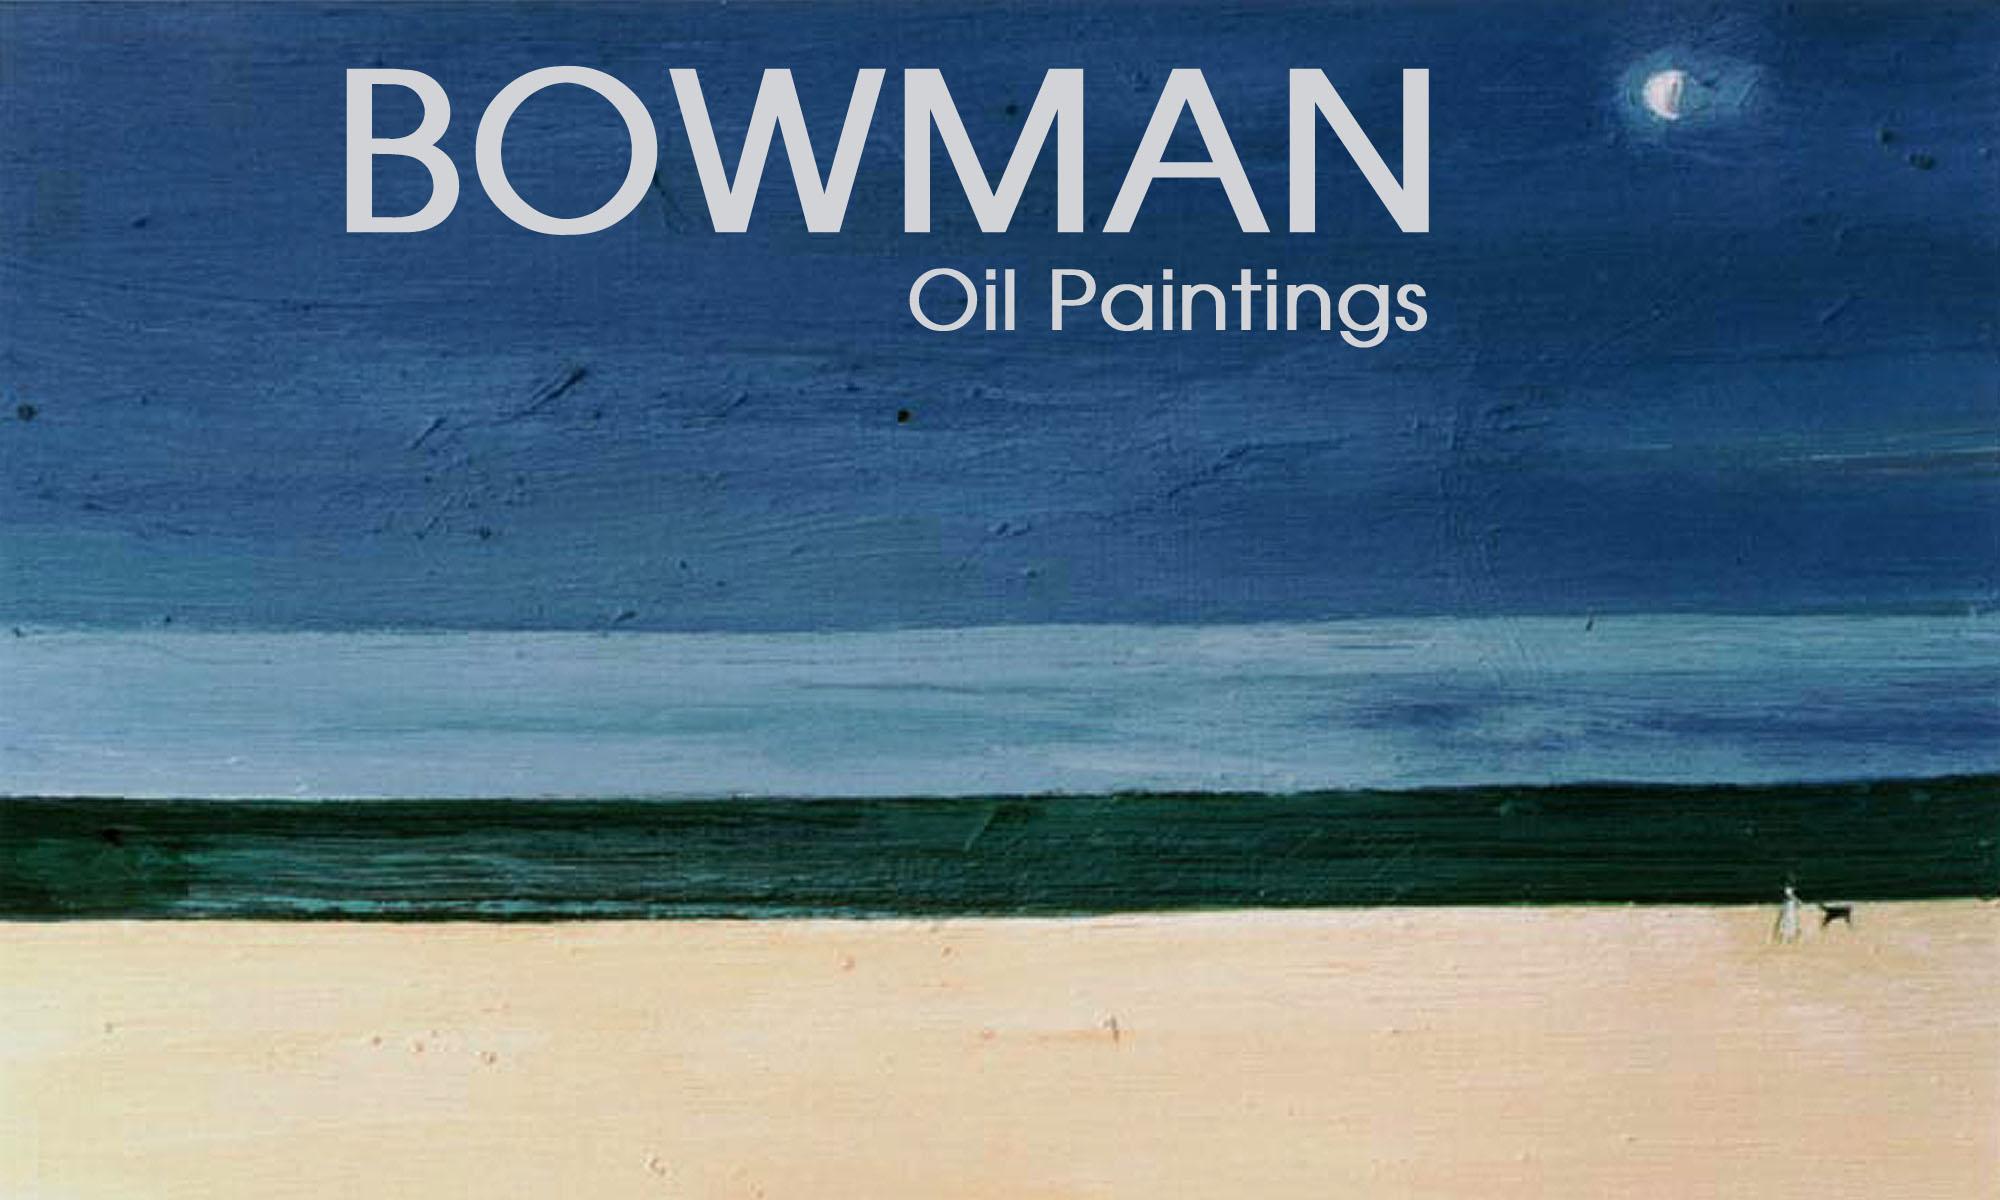 Bowman Oil Paintings